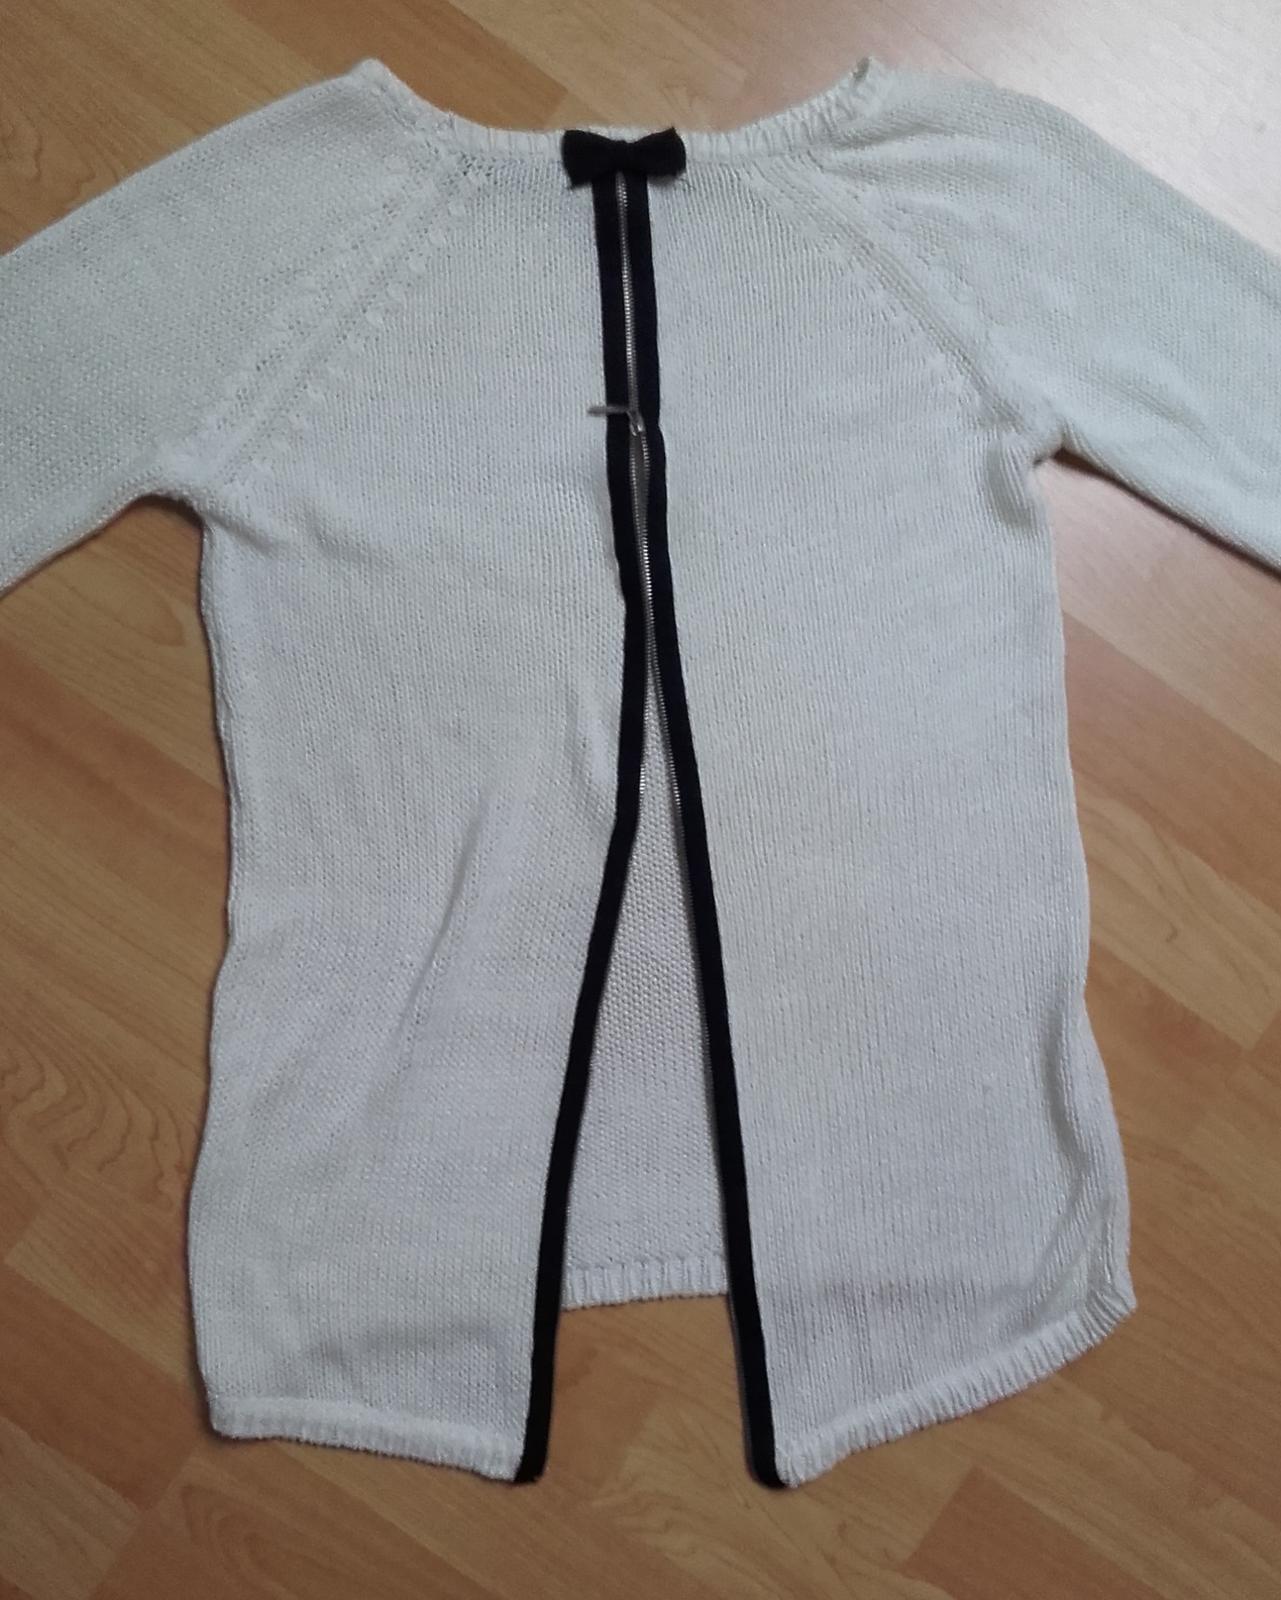 Krémový svetr vzadu s mašličkou a zipem - Obrázek č. 1